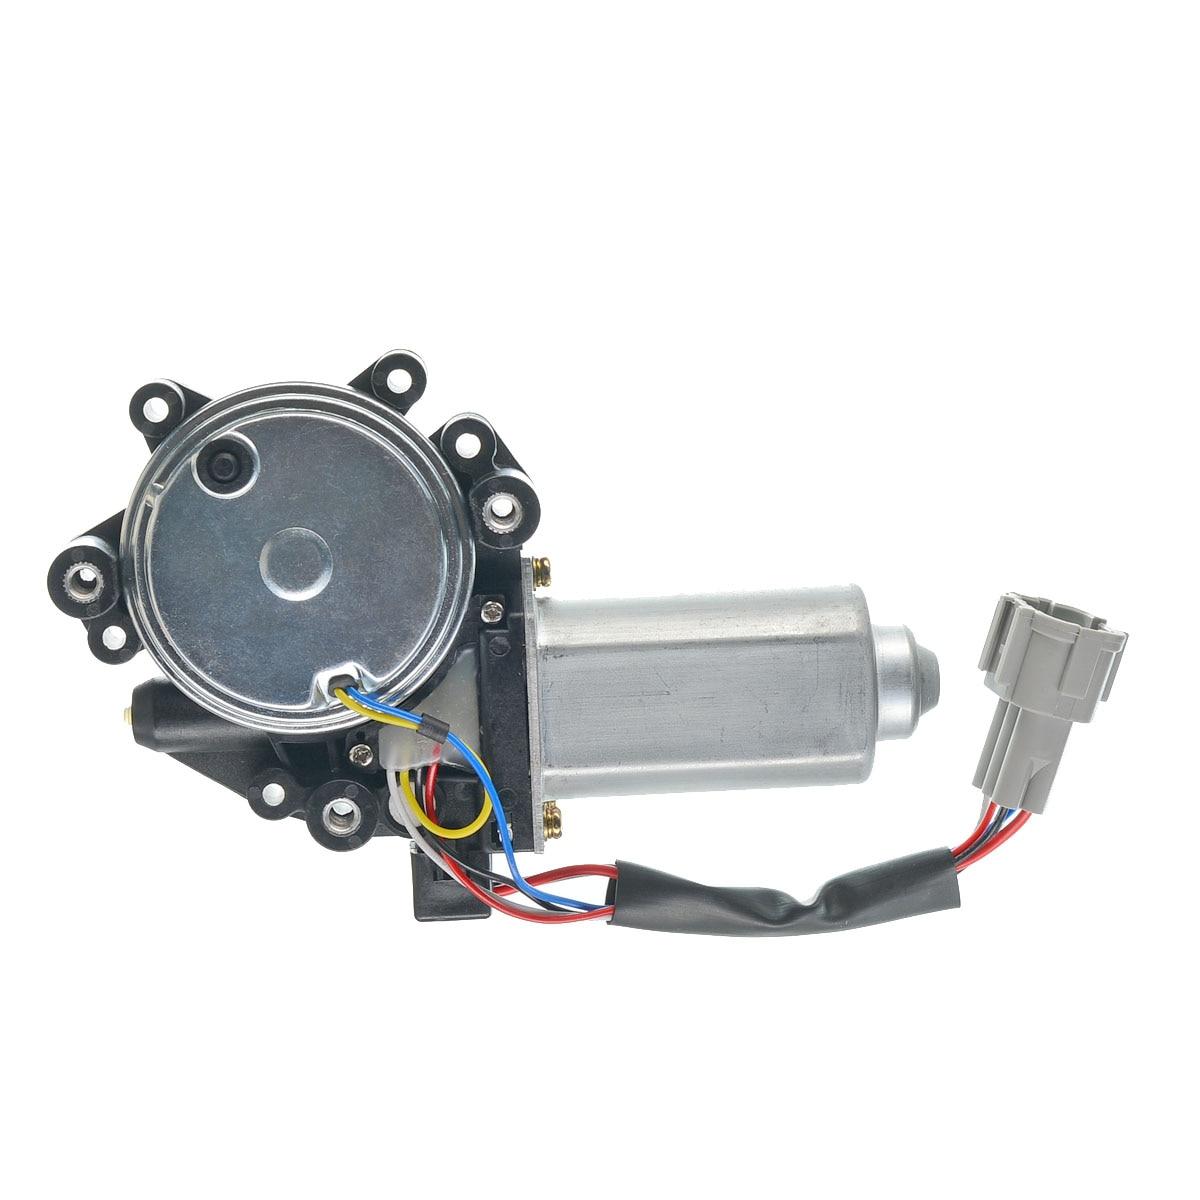 medium resolution of window lift motor for nissan armada titan 2004 2005 2006 2007 2008 2009 2010 2015 qx56 front right passenger